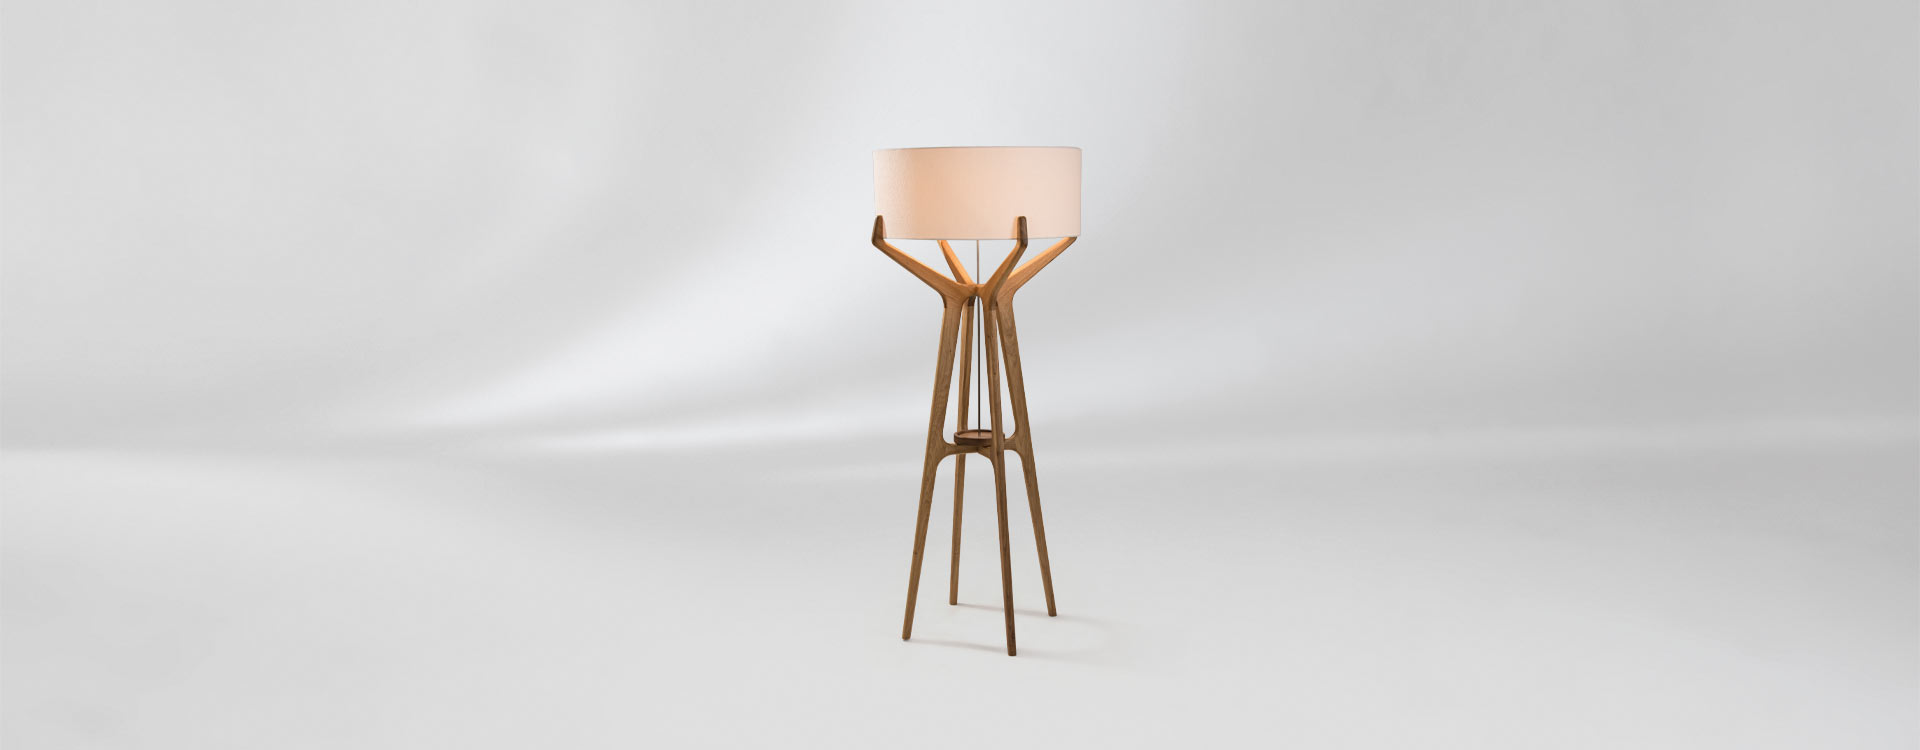 Luminária Lume by Bruno Faucz para marca Tissot